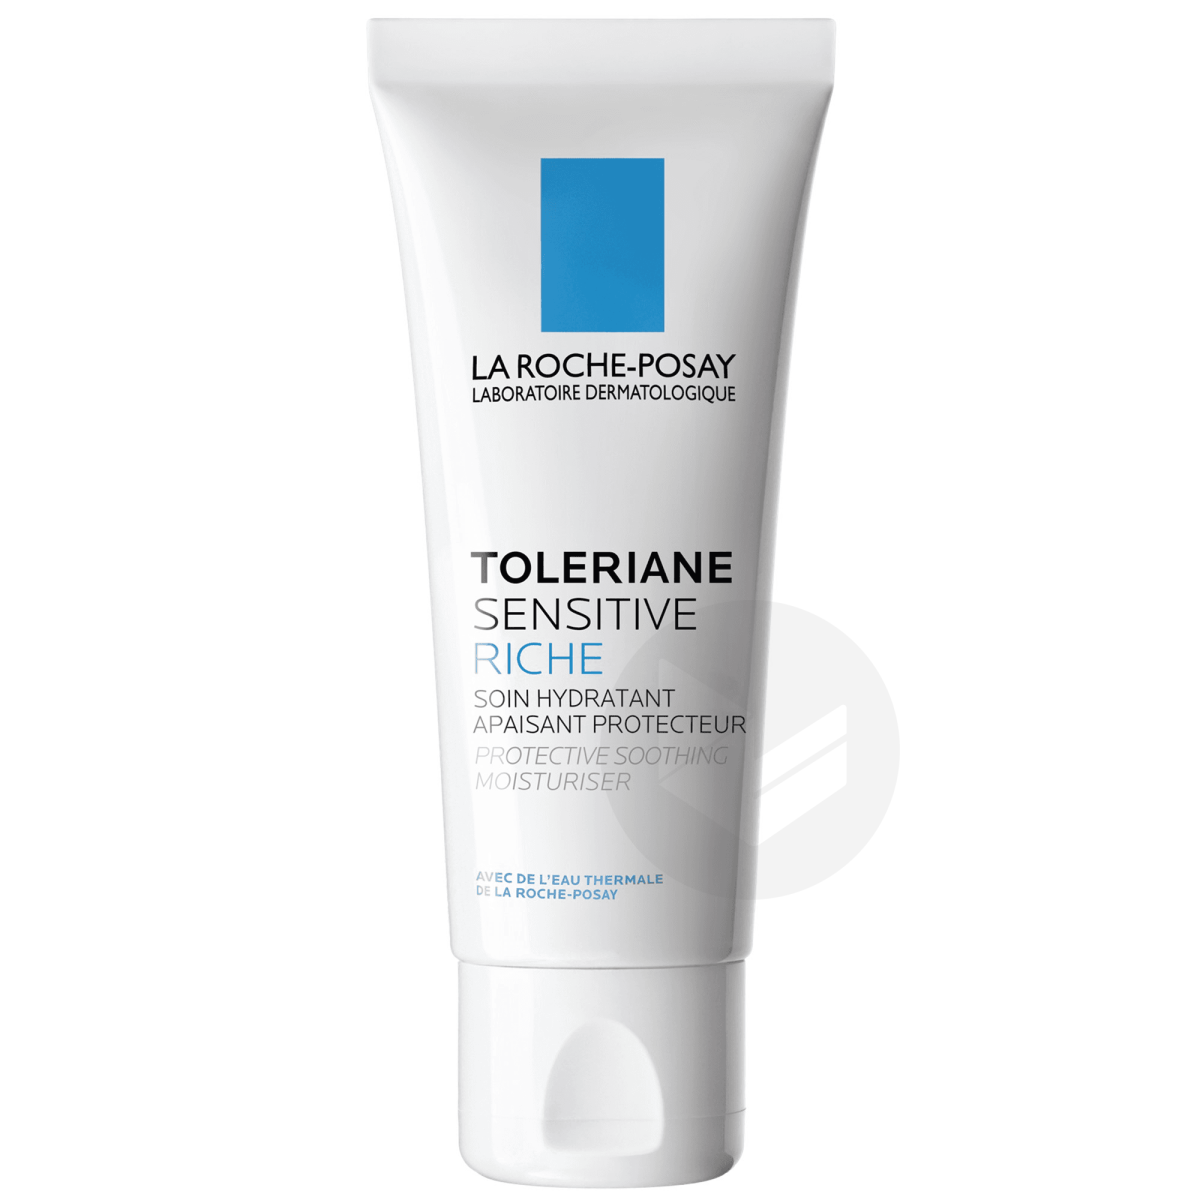 Toleriane Sensitive Soin riche hydratant apaisant protecteur 40ml